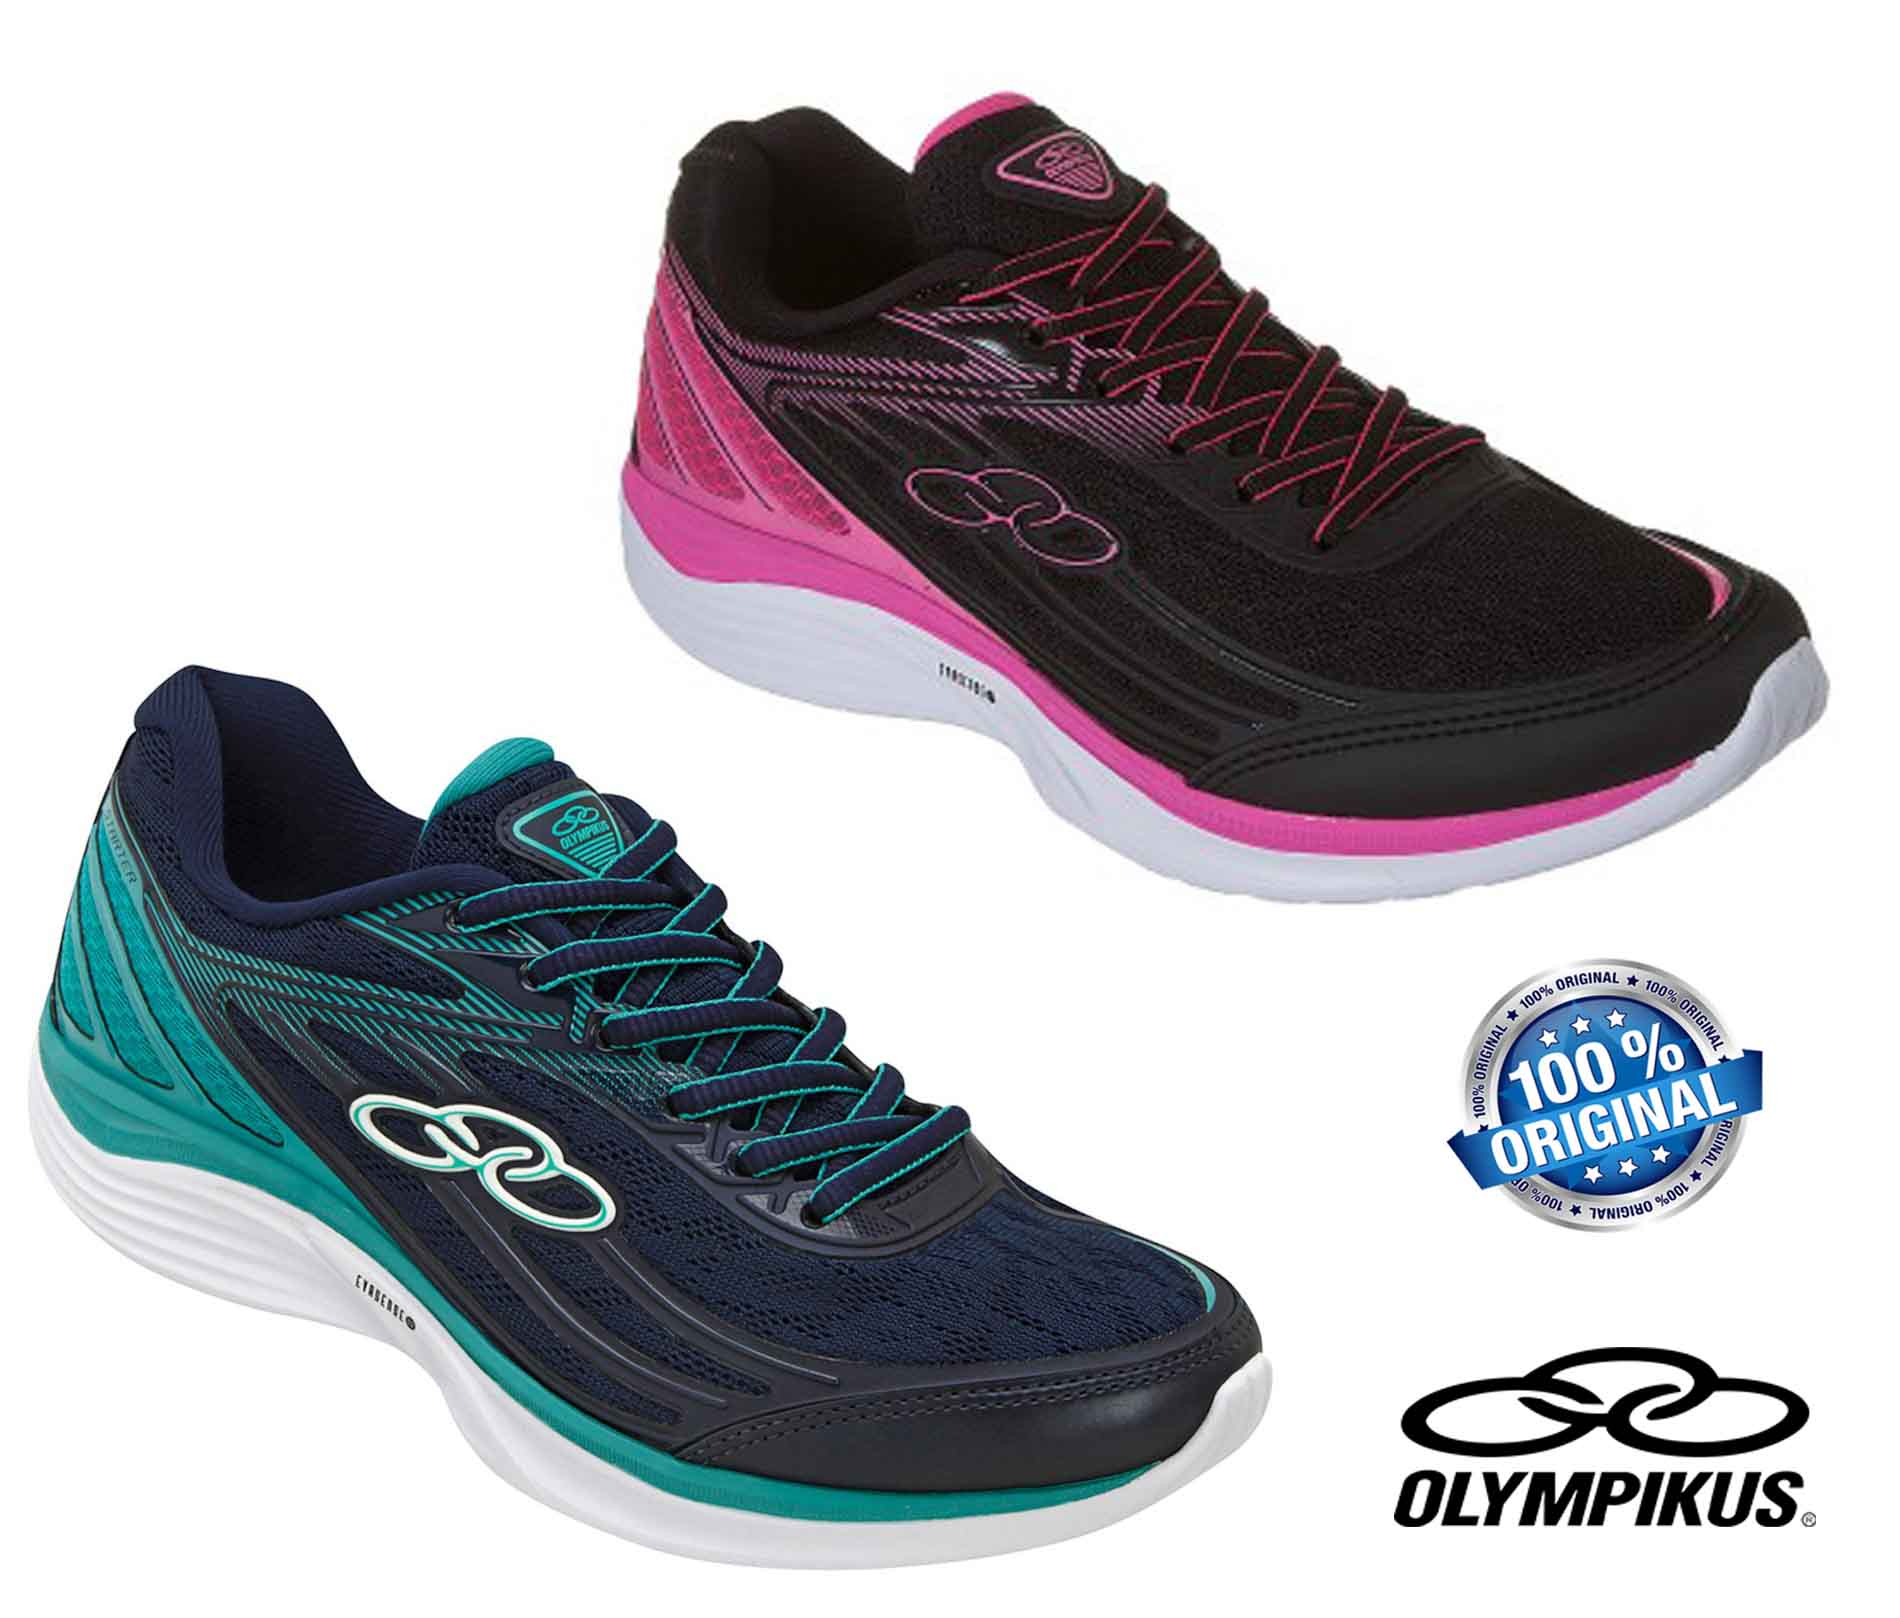 Tênis Feminino Olympikus Starter/341 Marinho E Preto - 20341